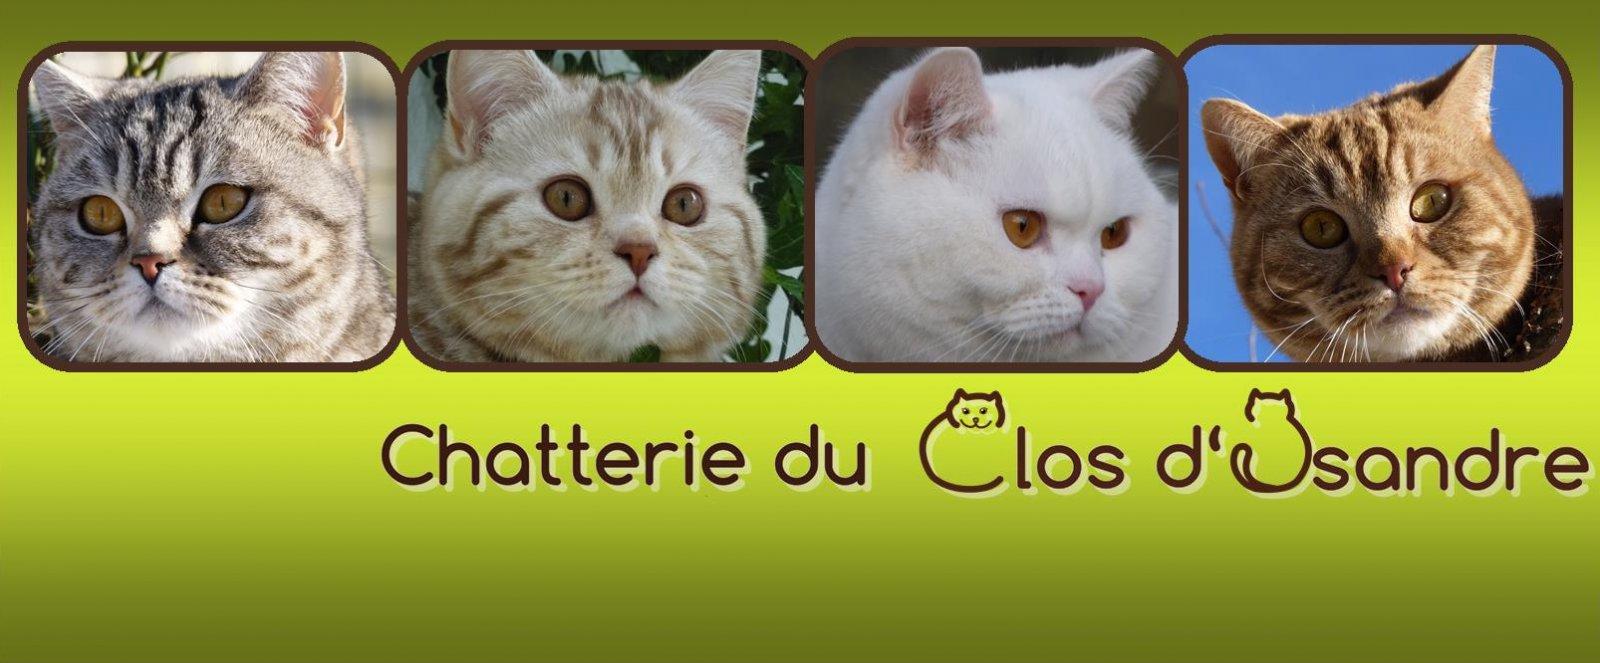 Chatterie Du Clos D'isandre